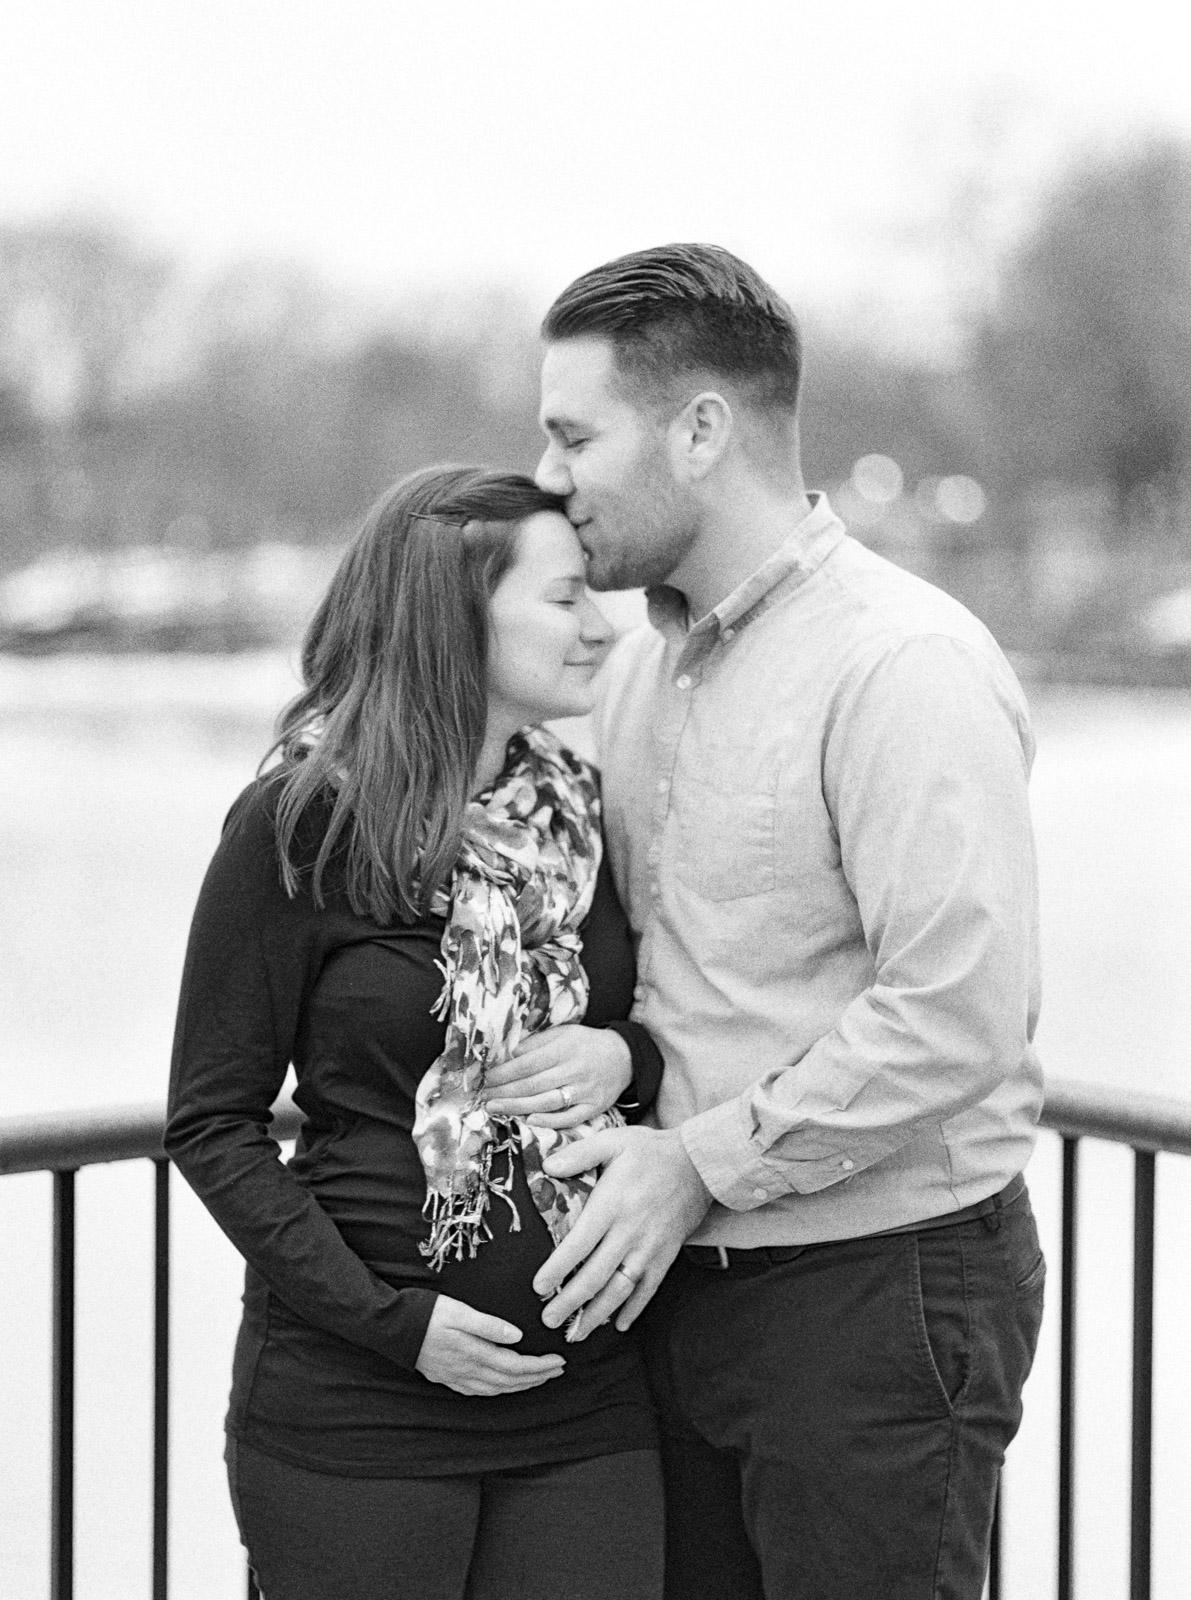 Coe Lake Maternity Photos by Cleveland Wedding Photographer Matt Erickson Photography